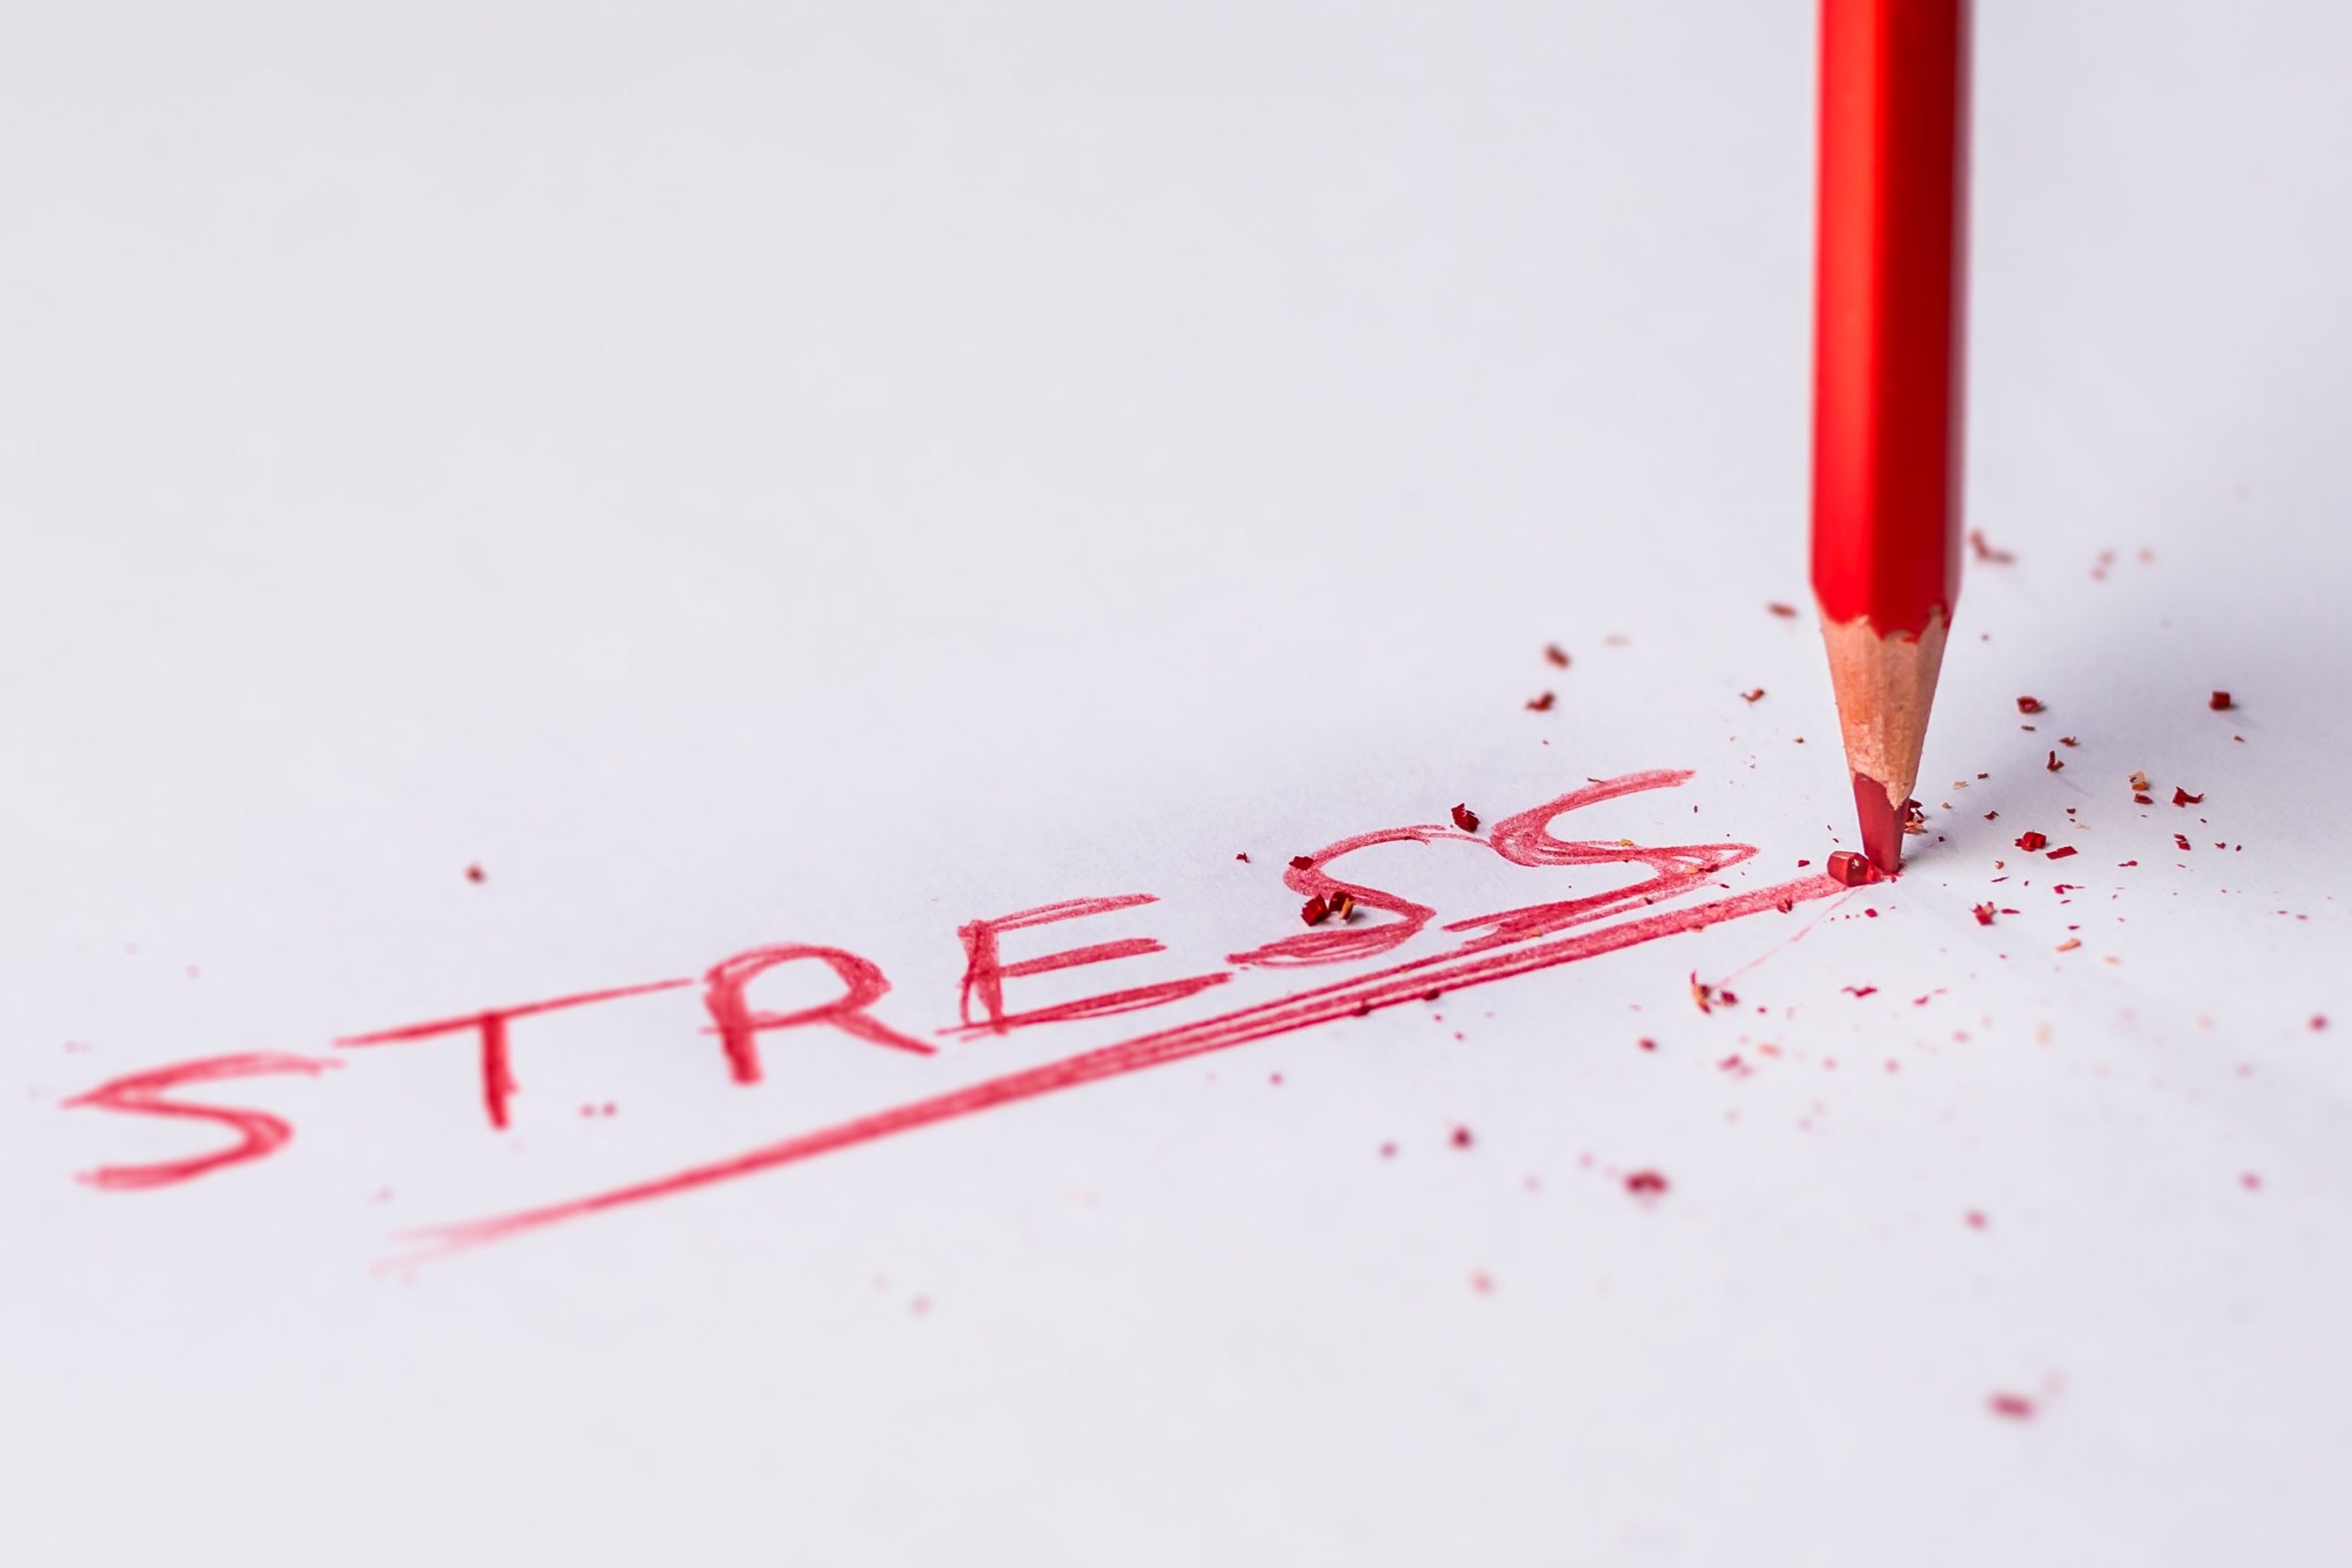 Reč stres napisana crvenom bojicom na beloj pozadini